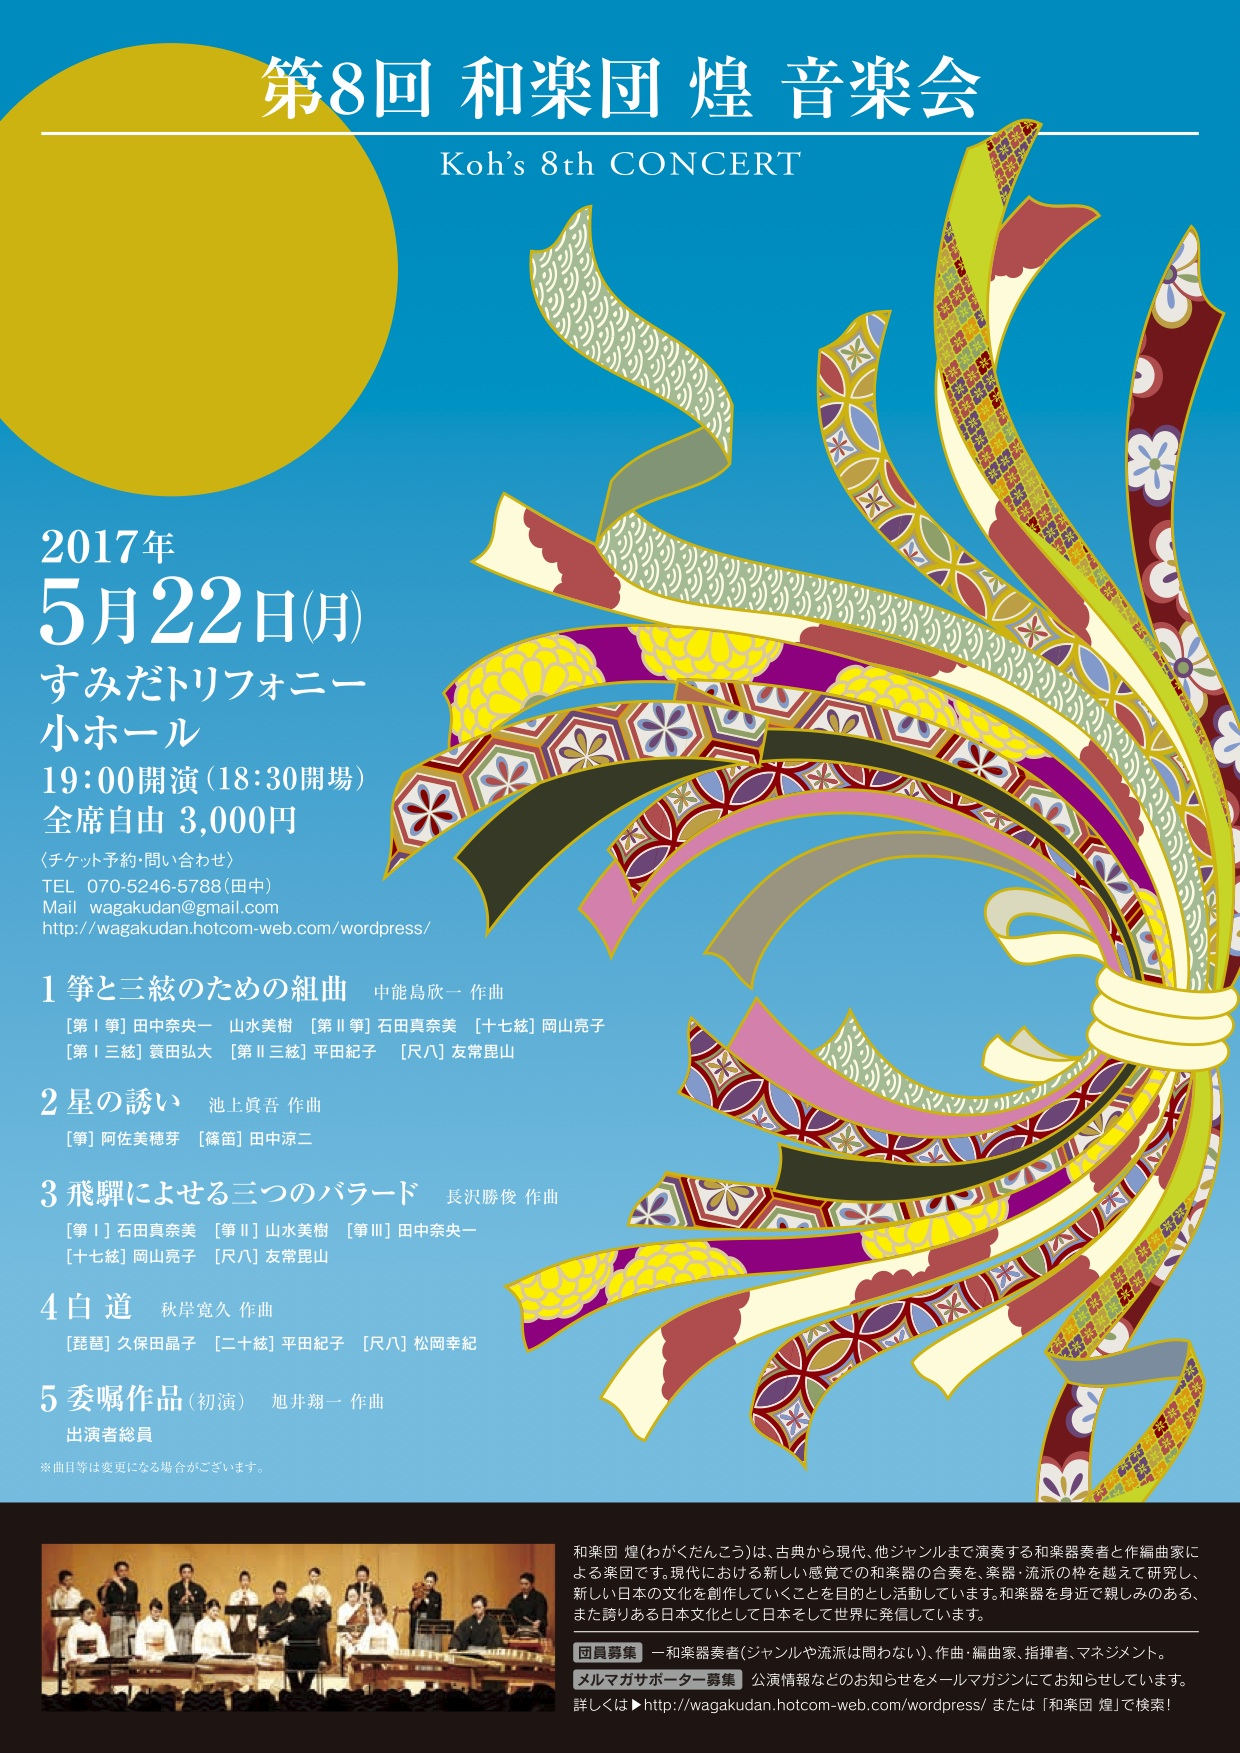 Koh2017_Flyer